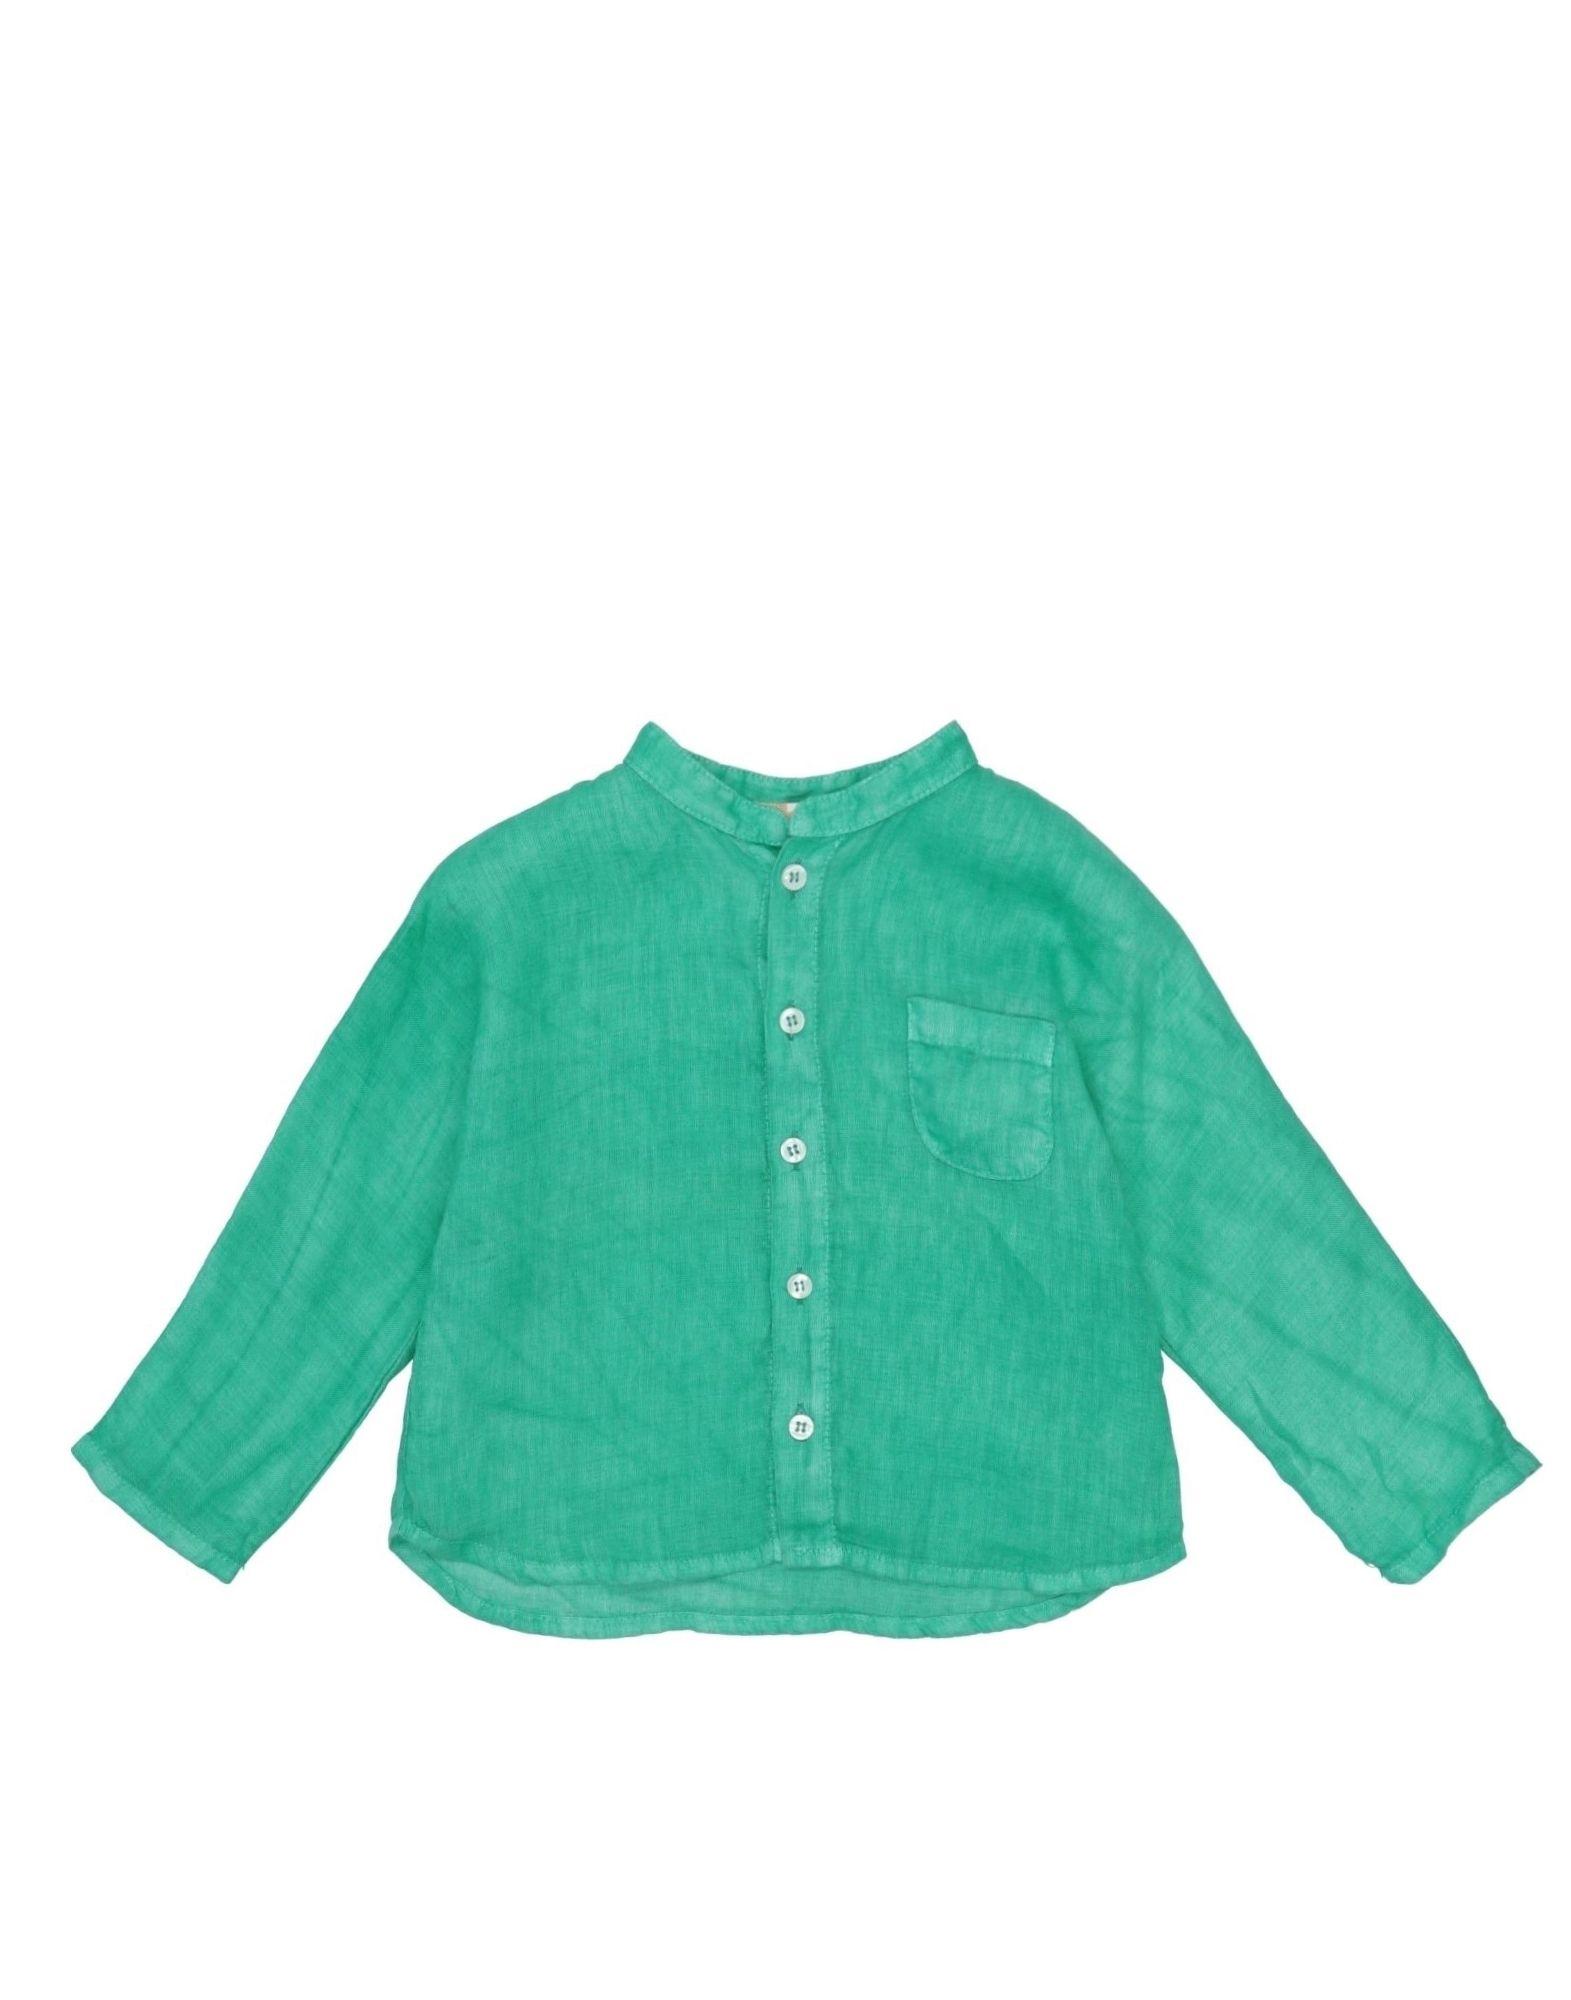 Muffin & Co. Kids' Shirts In Green